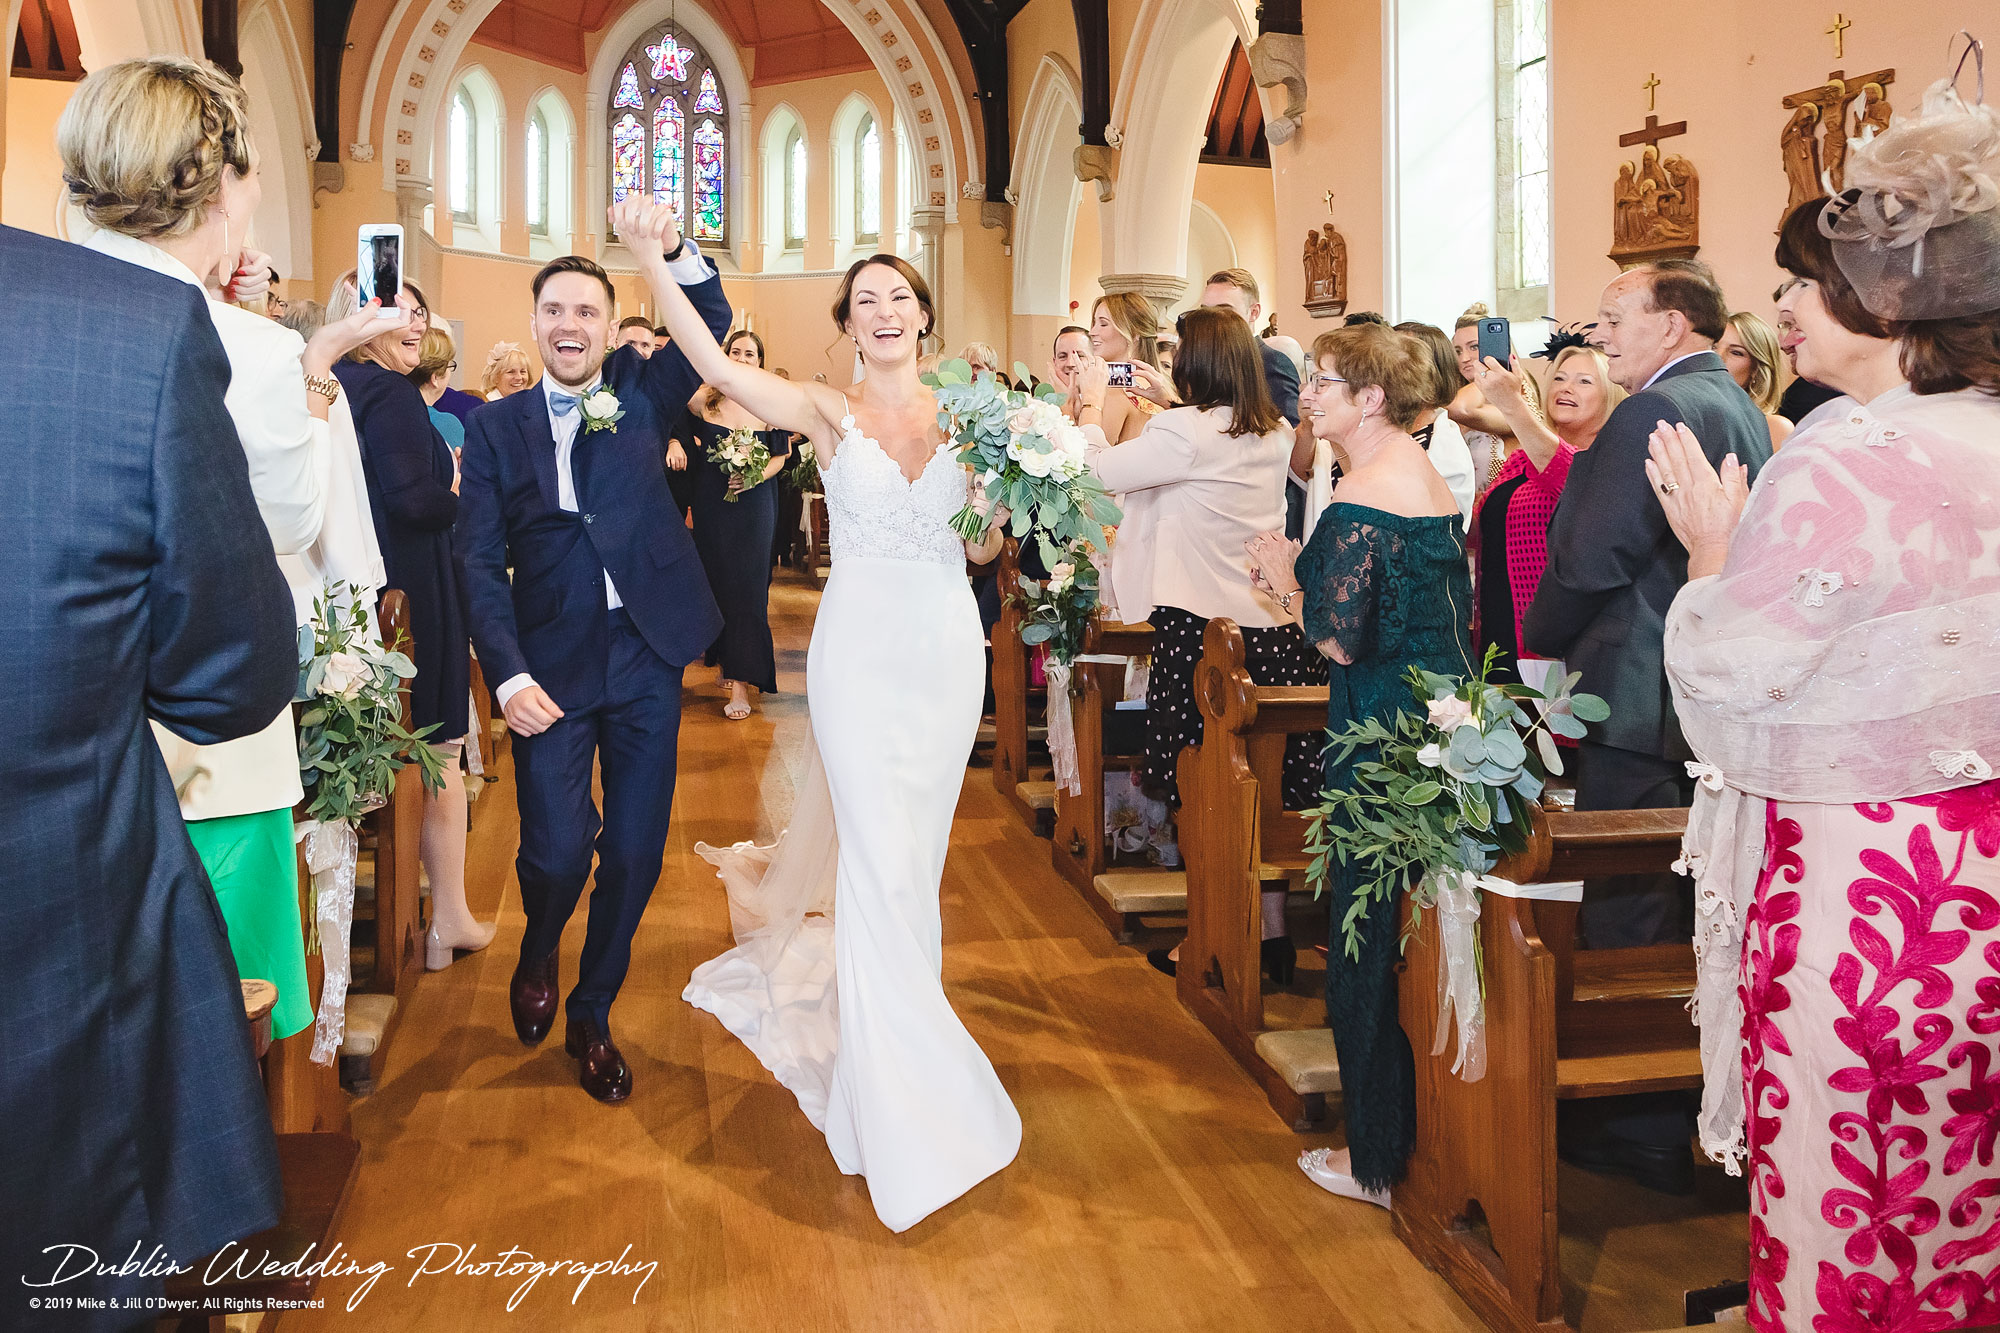 wedding-photographers-wicklow-tinakilly-house-2019-27.jpg